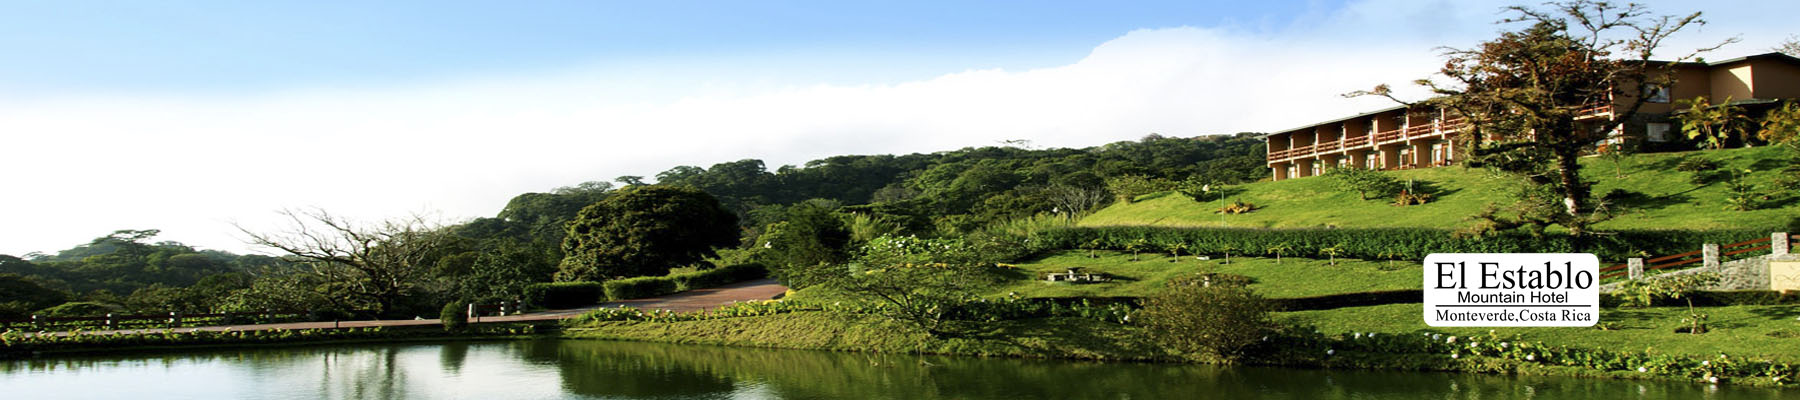 view's hotel establo monteverde